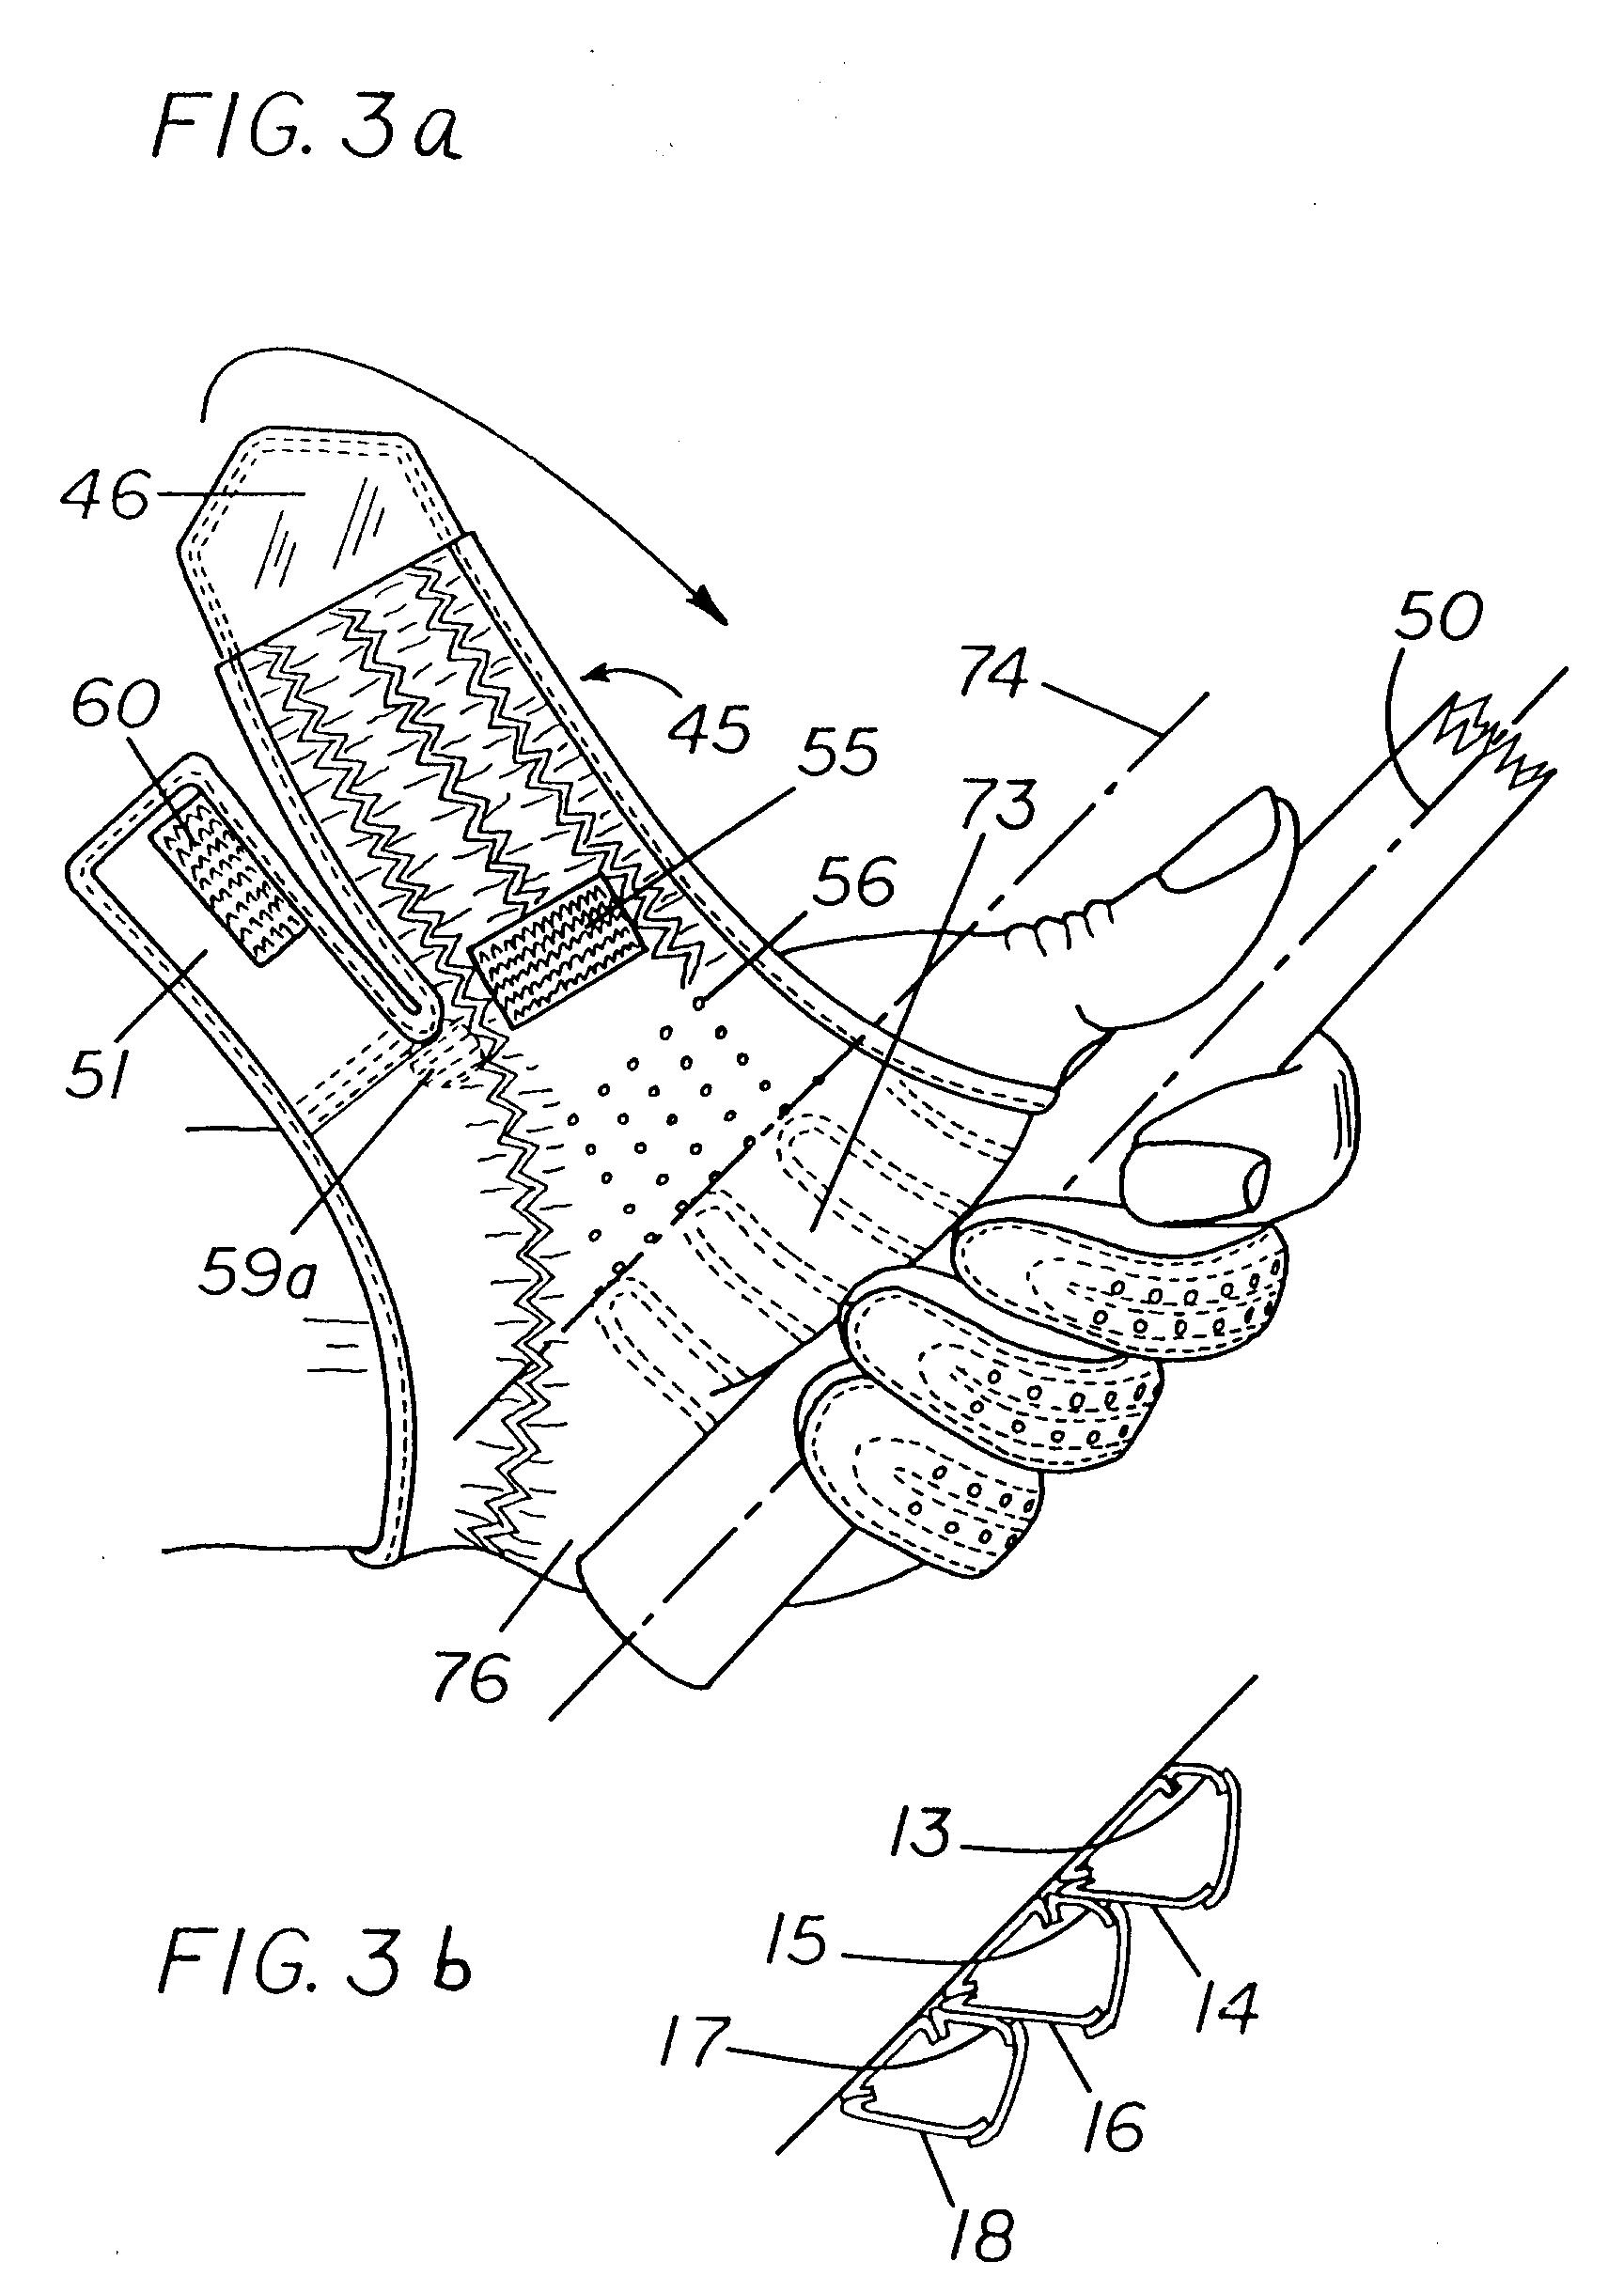 Snapper rear engine mower wiring diagram wiring diagram imgf0002 snapper rear engine mower wiring diagram